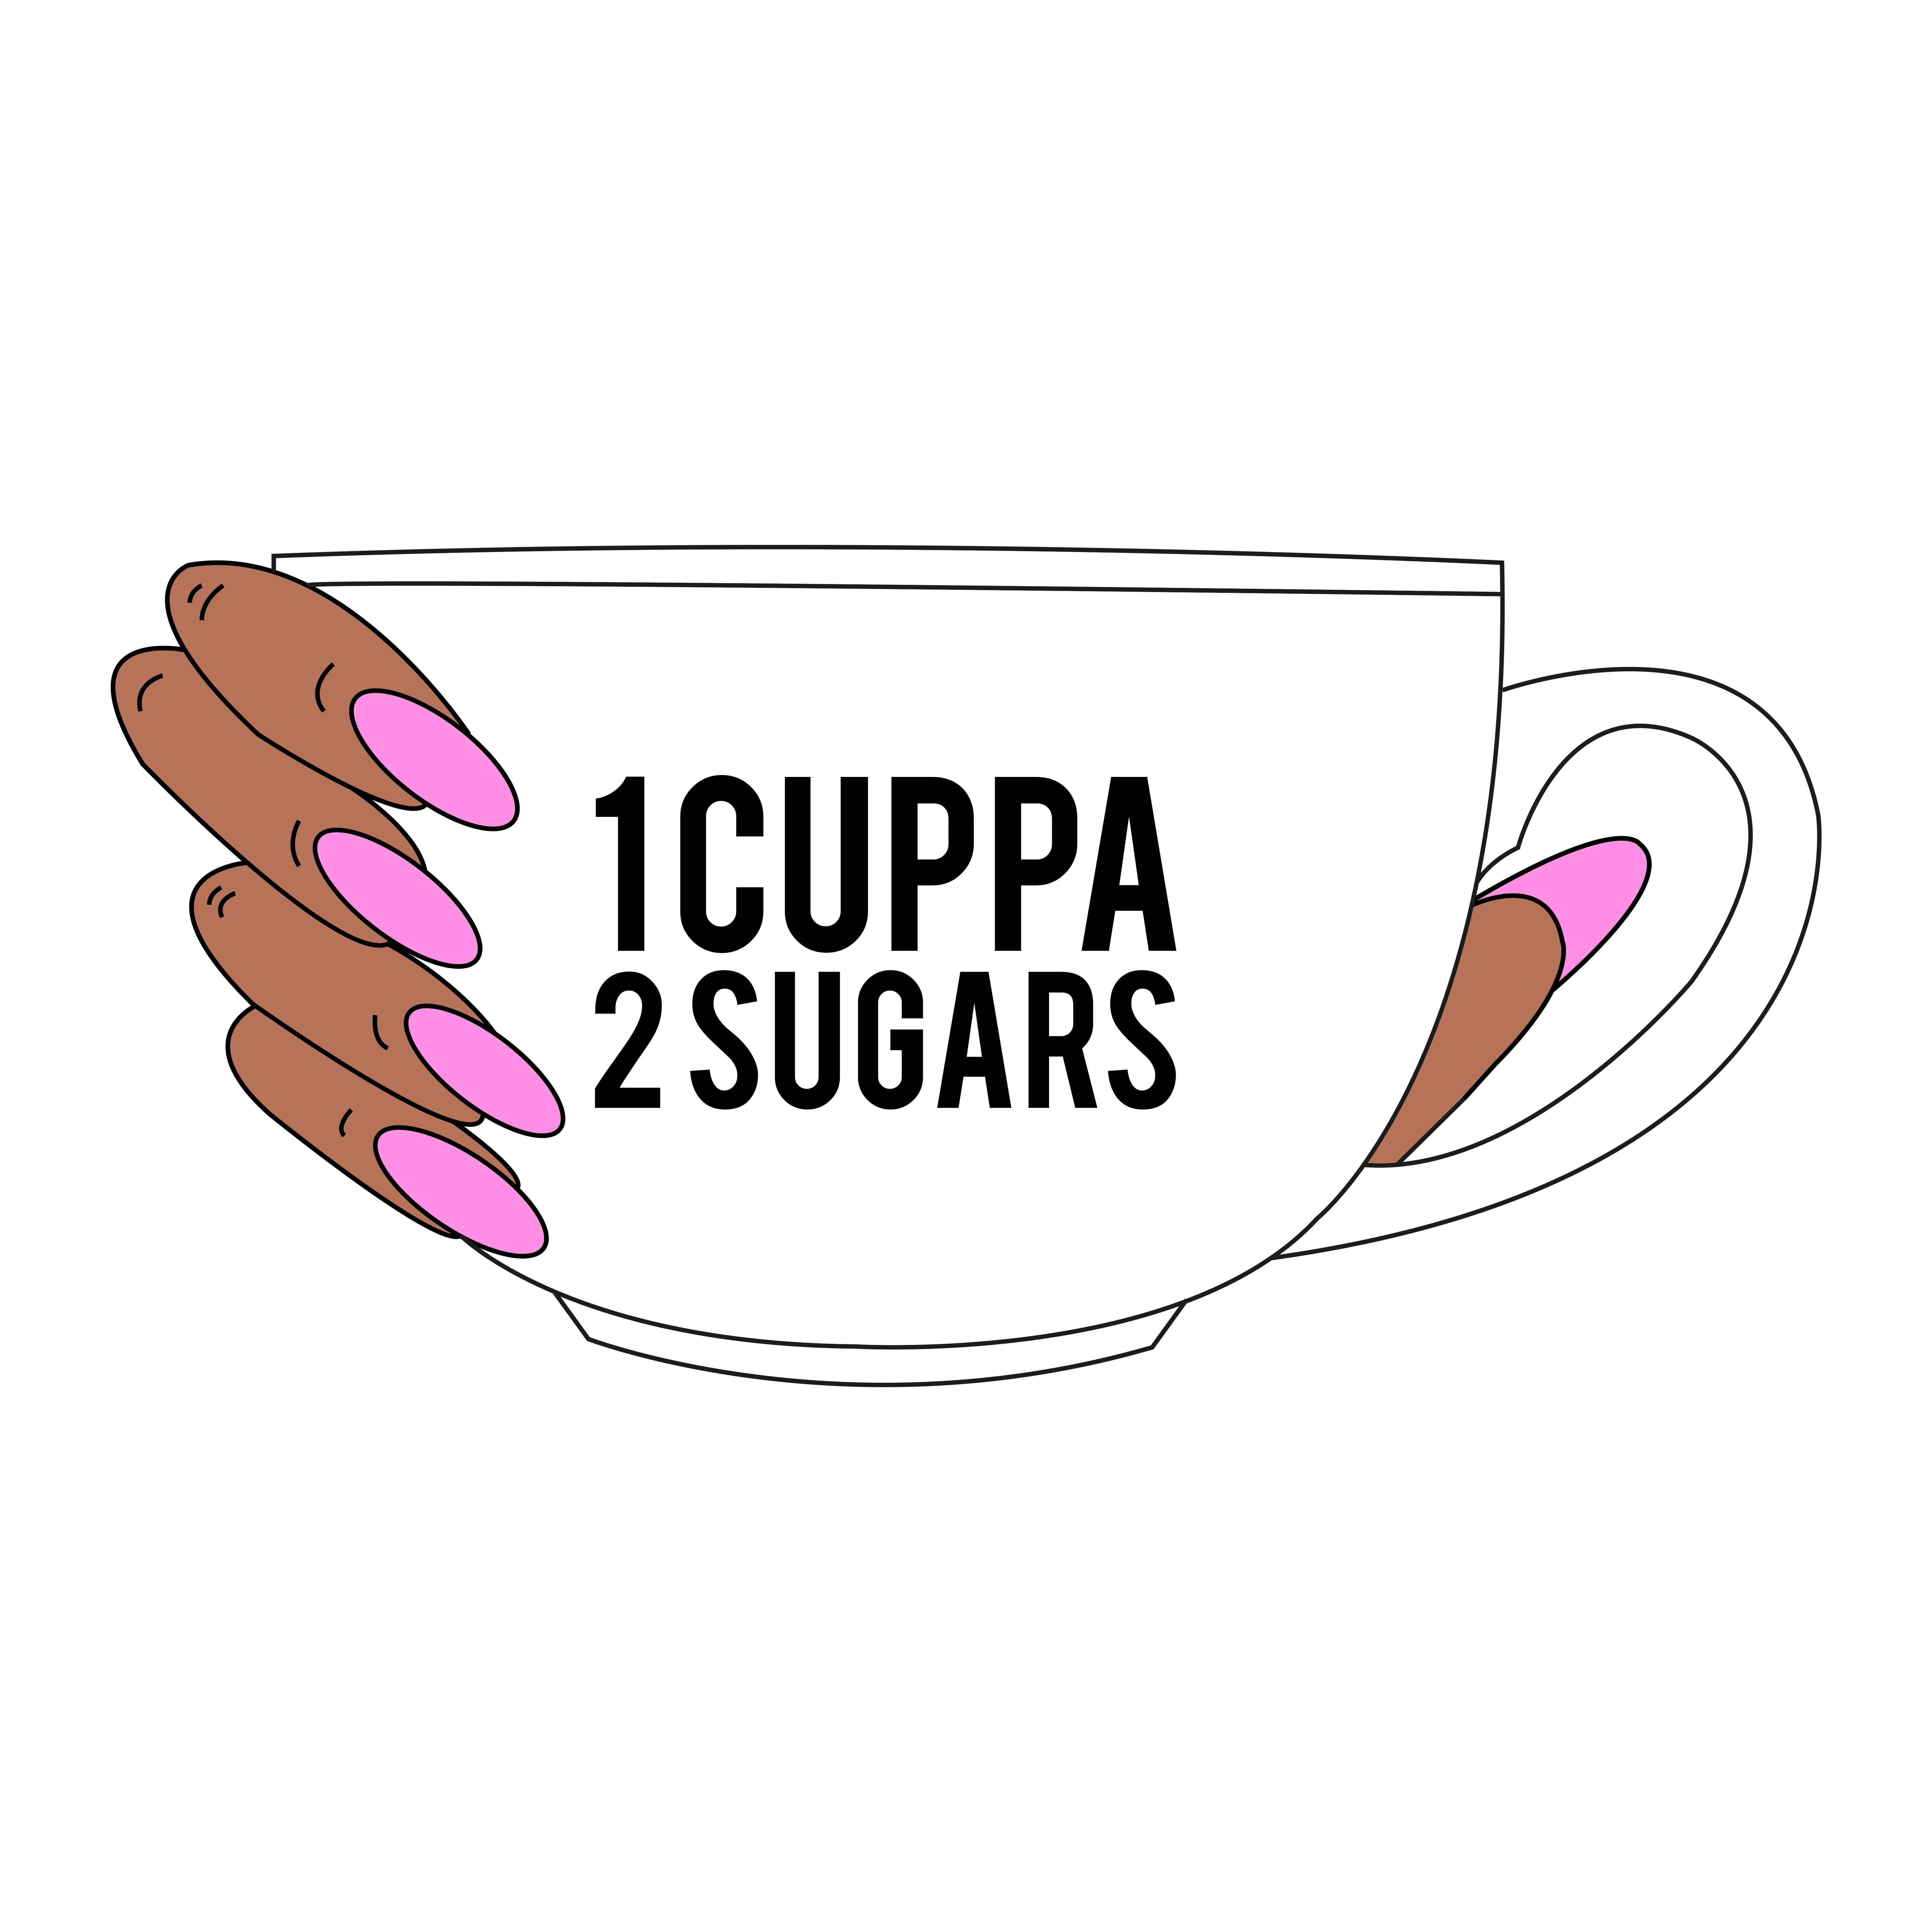 1Cuppa 2Sugars